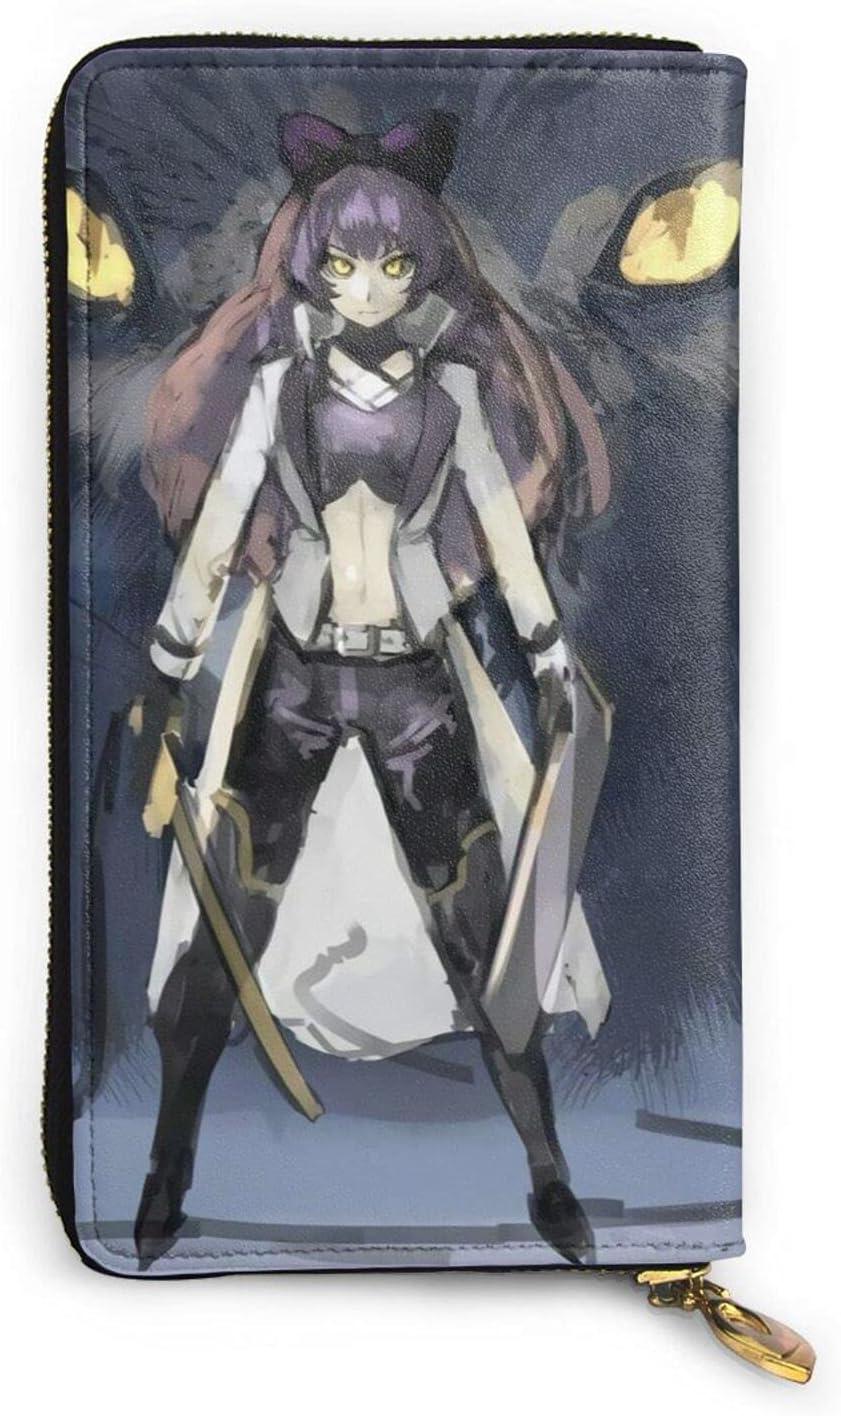 RWBY Blake Belladonna anime Classic Department store Leather Craft C Popular Card Regular discount